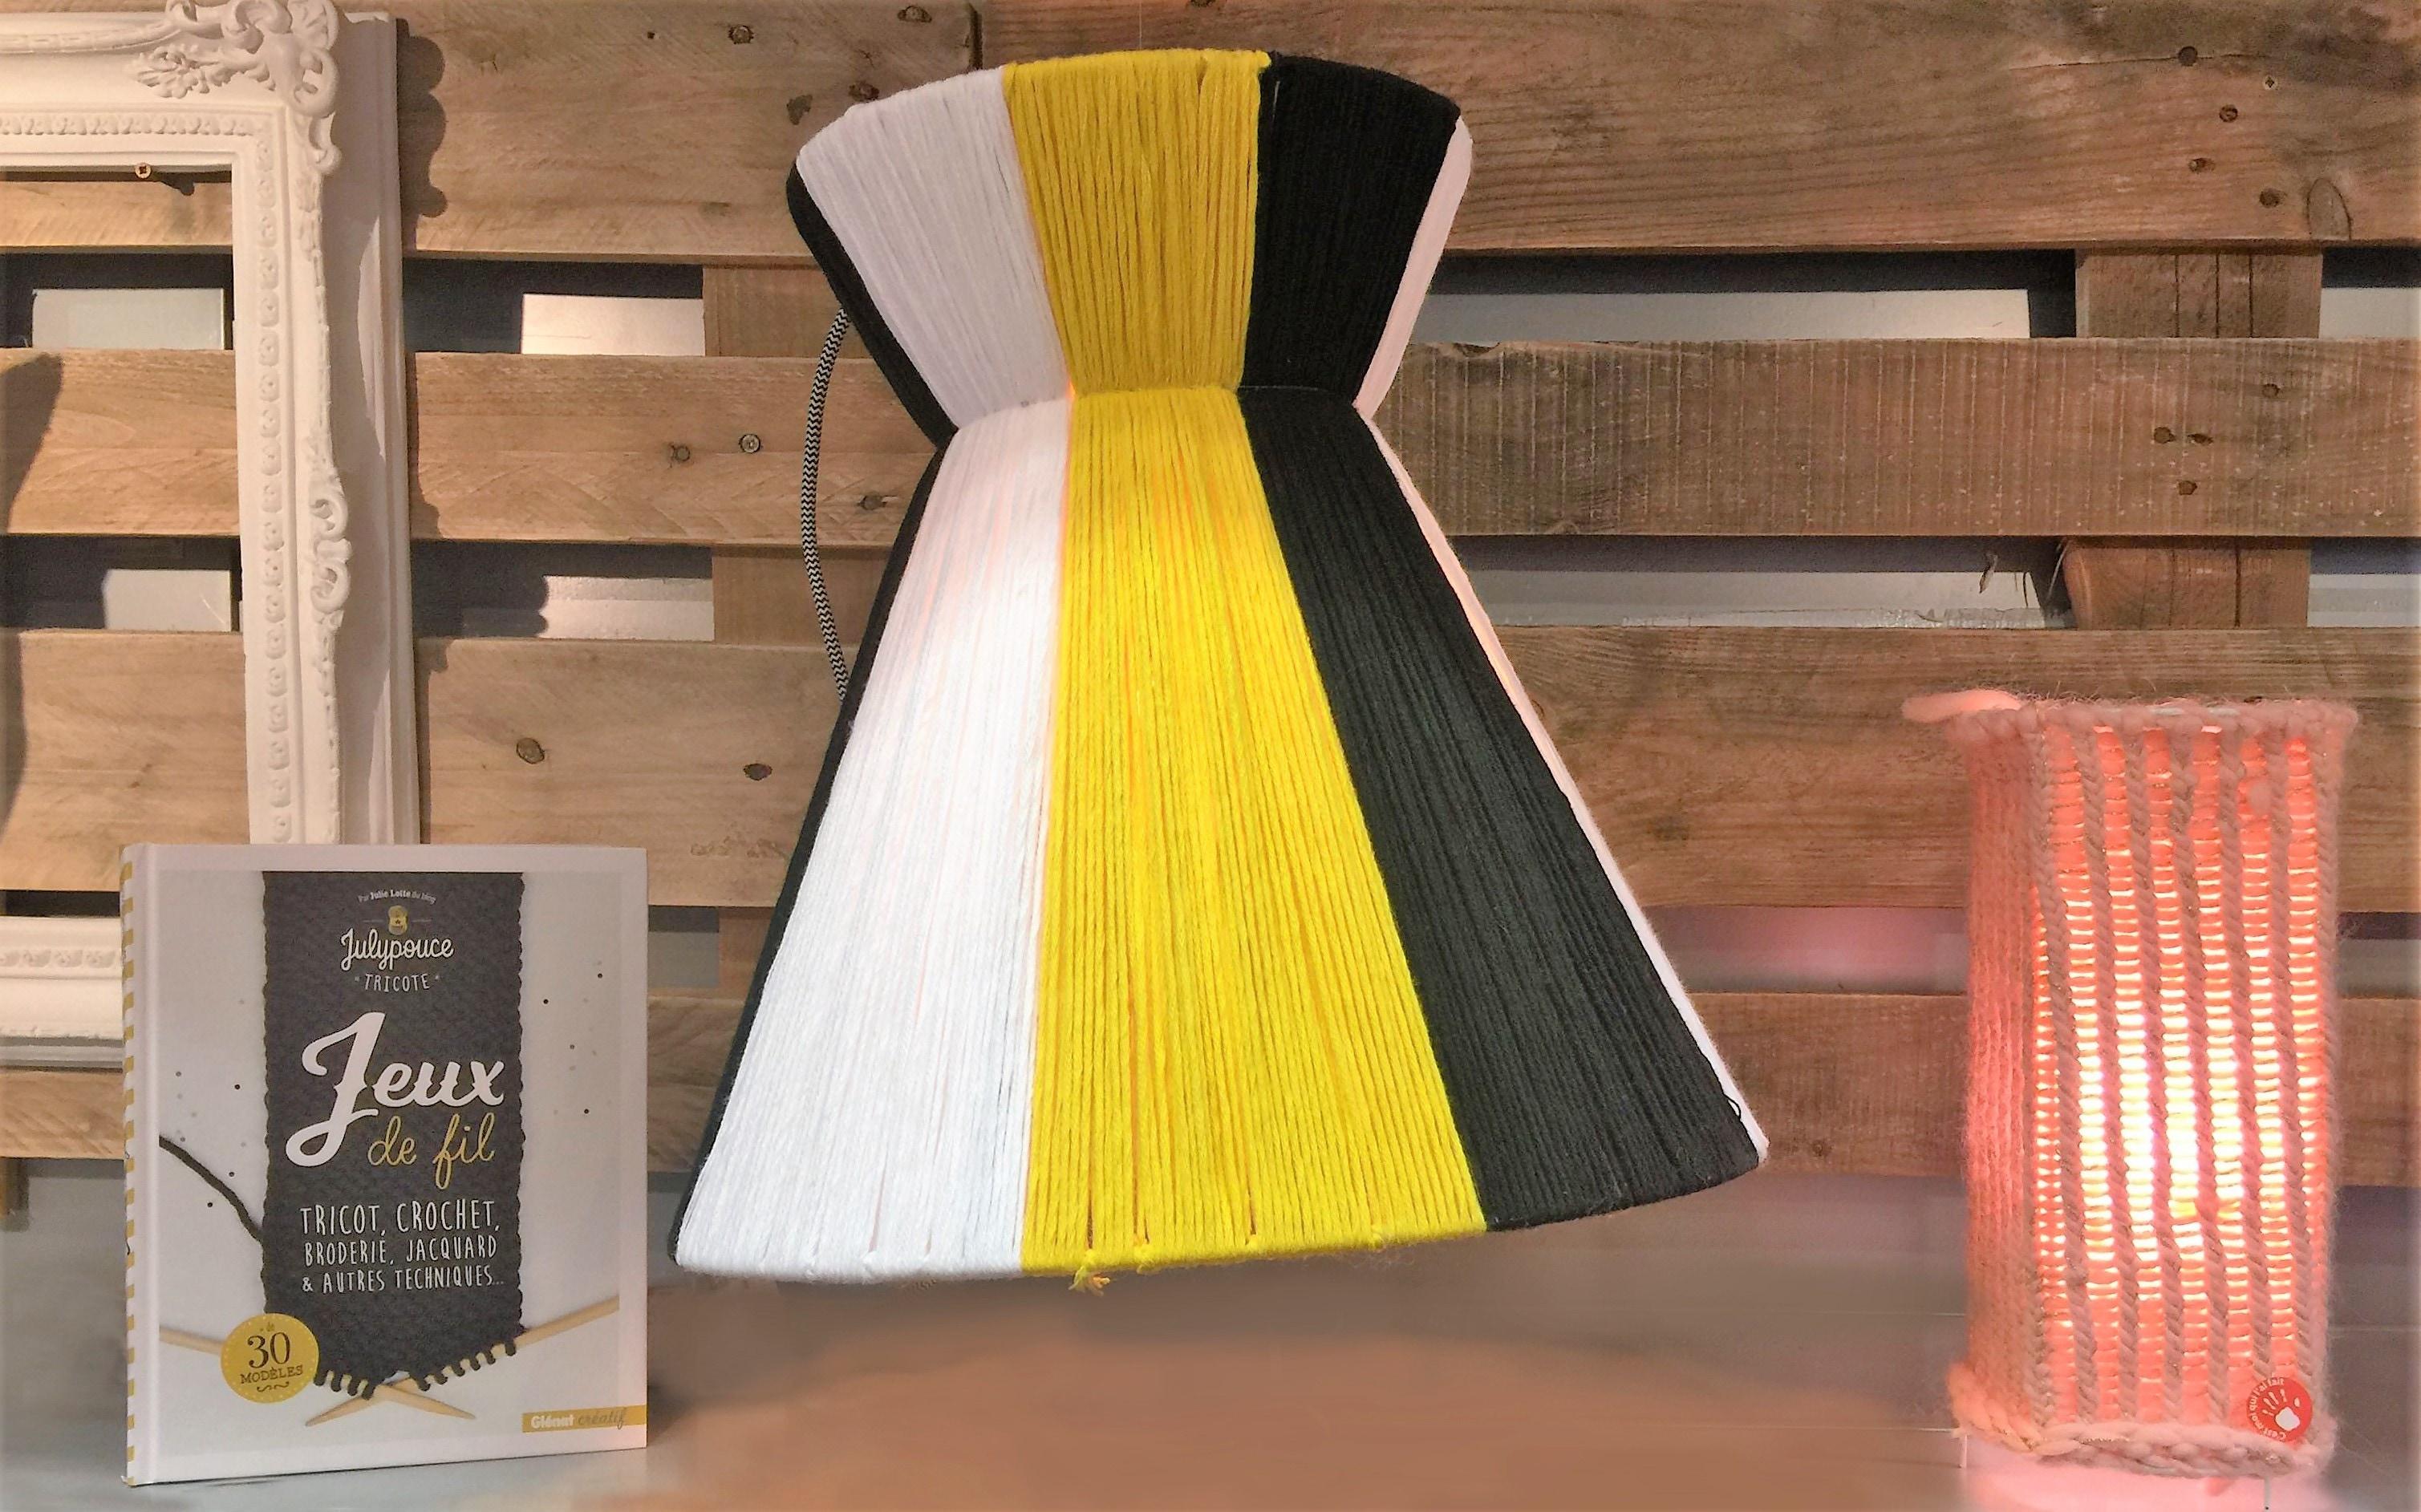 phildar pelote de laine charly jaune colza 50g pas cher z dio. Black Bedroom Furniture Sets. Home Design Ideas